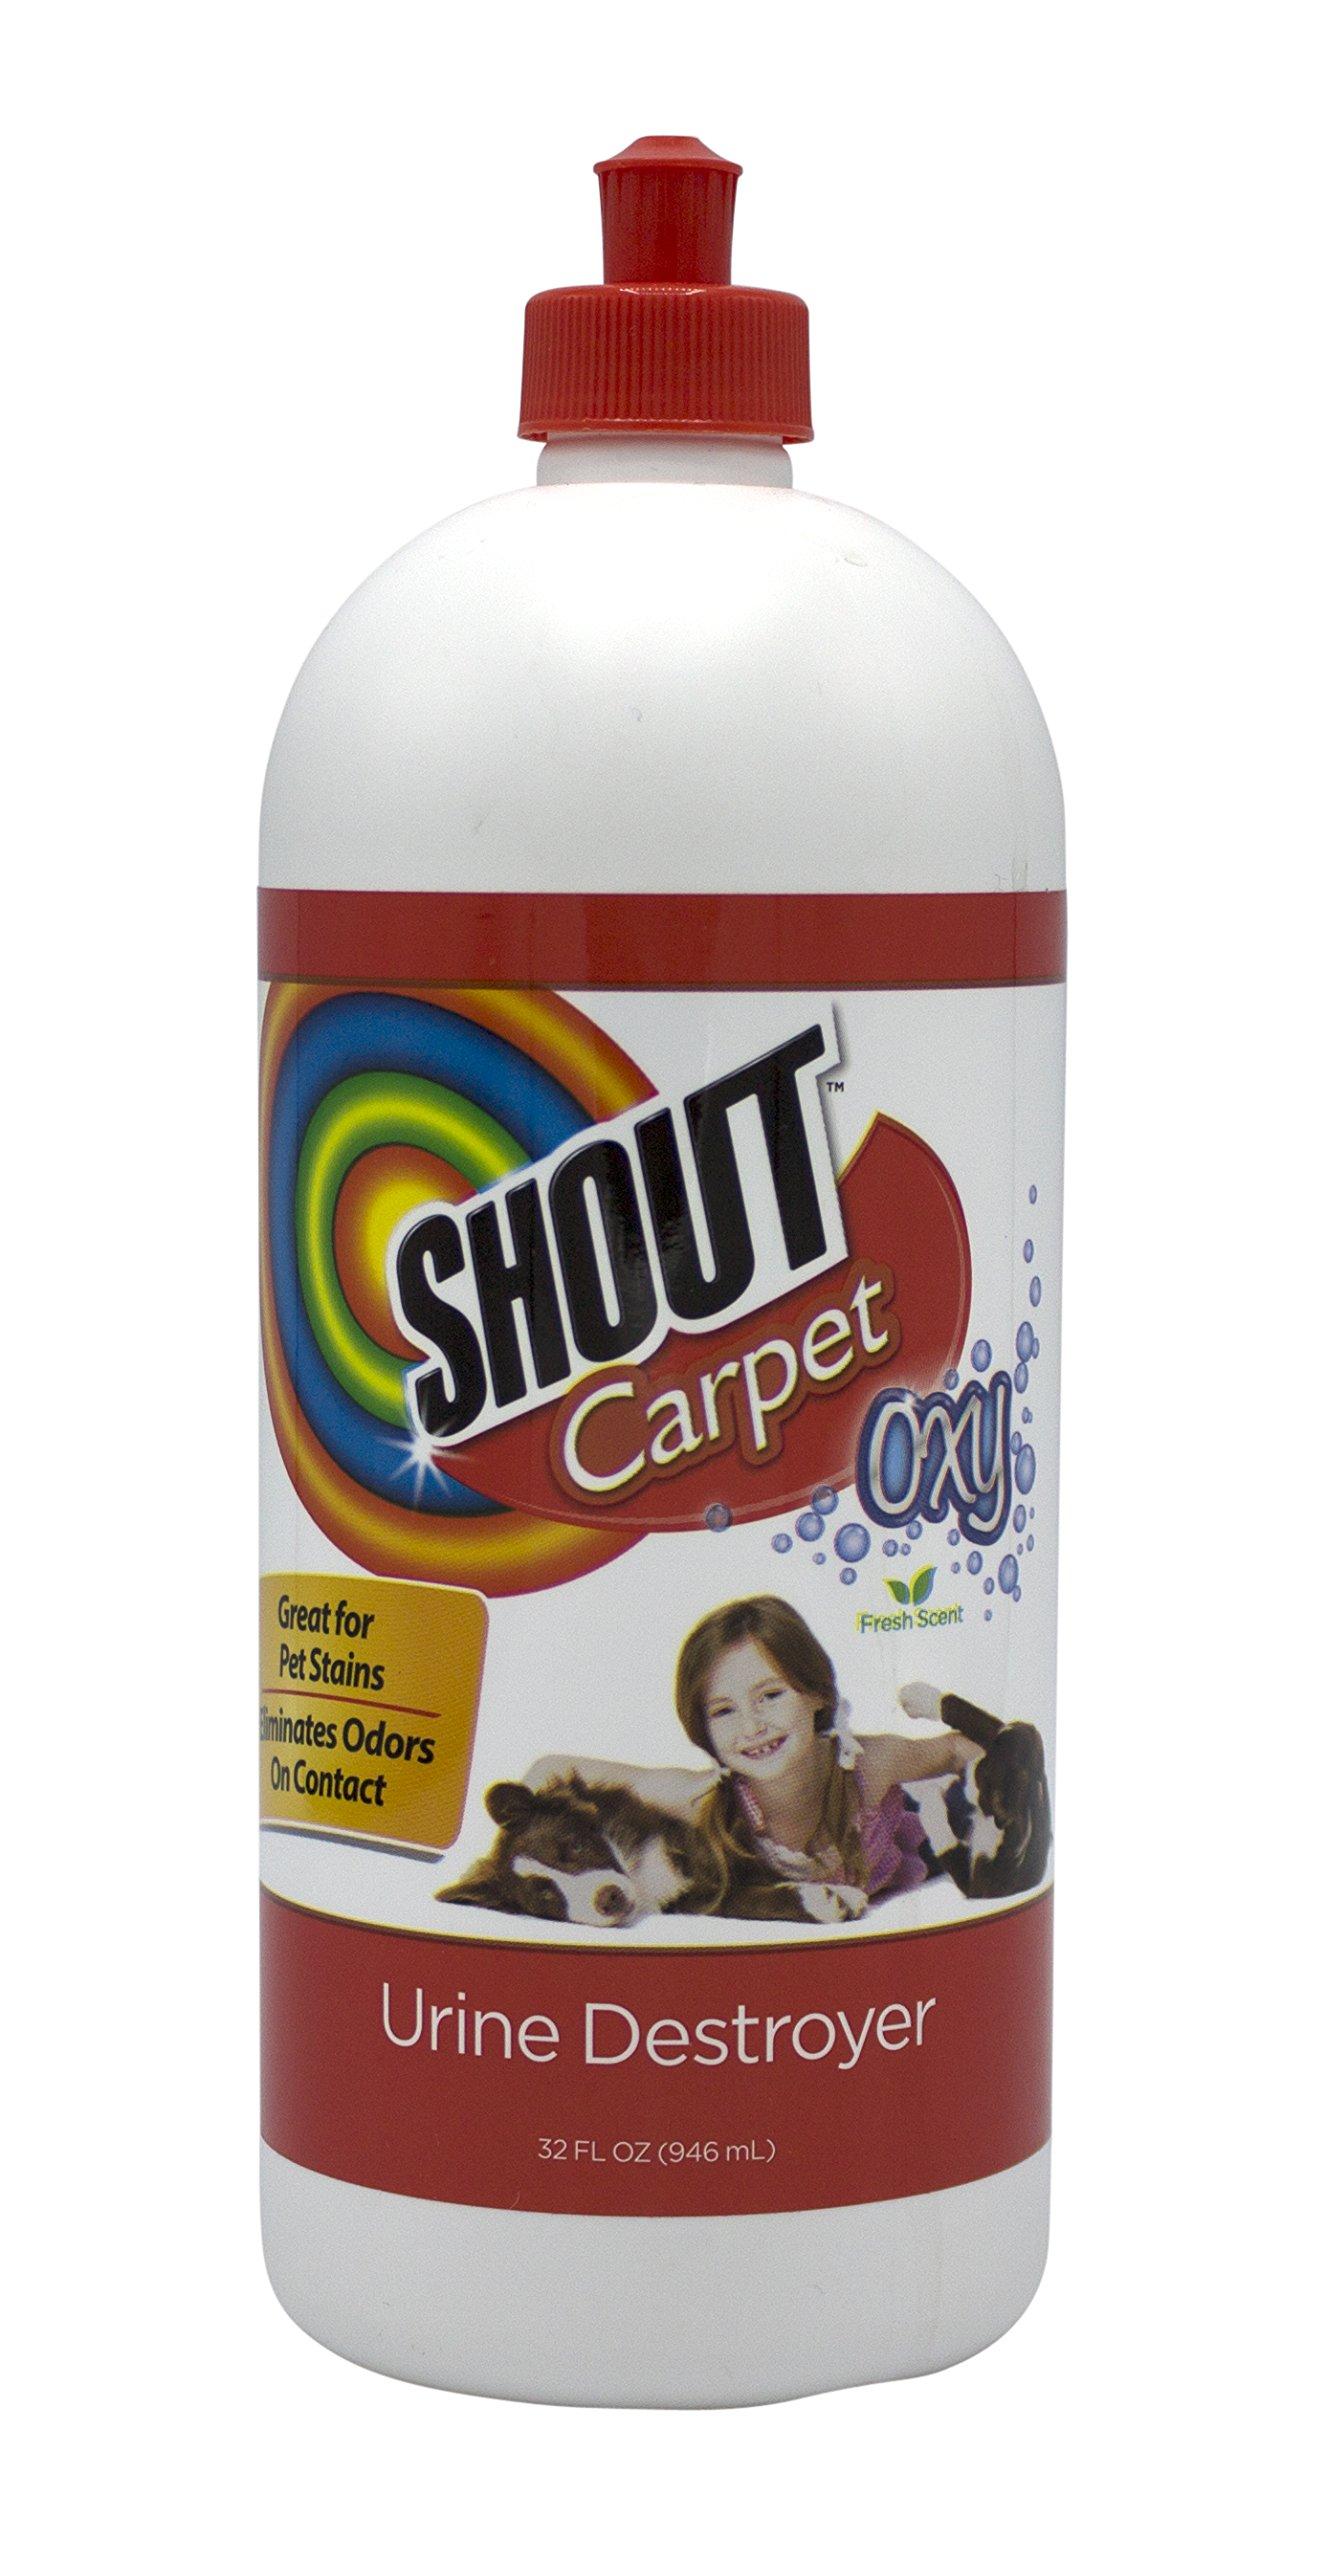 Shout Carpet Carpet Cleaner, Pack of 2, 32 Ounce by Shout Carpet